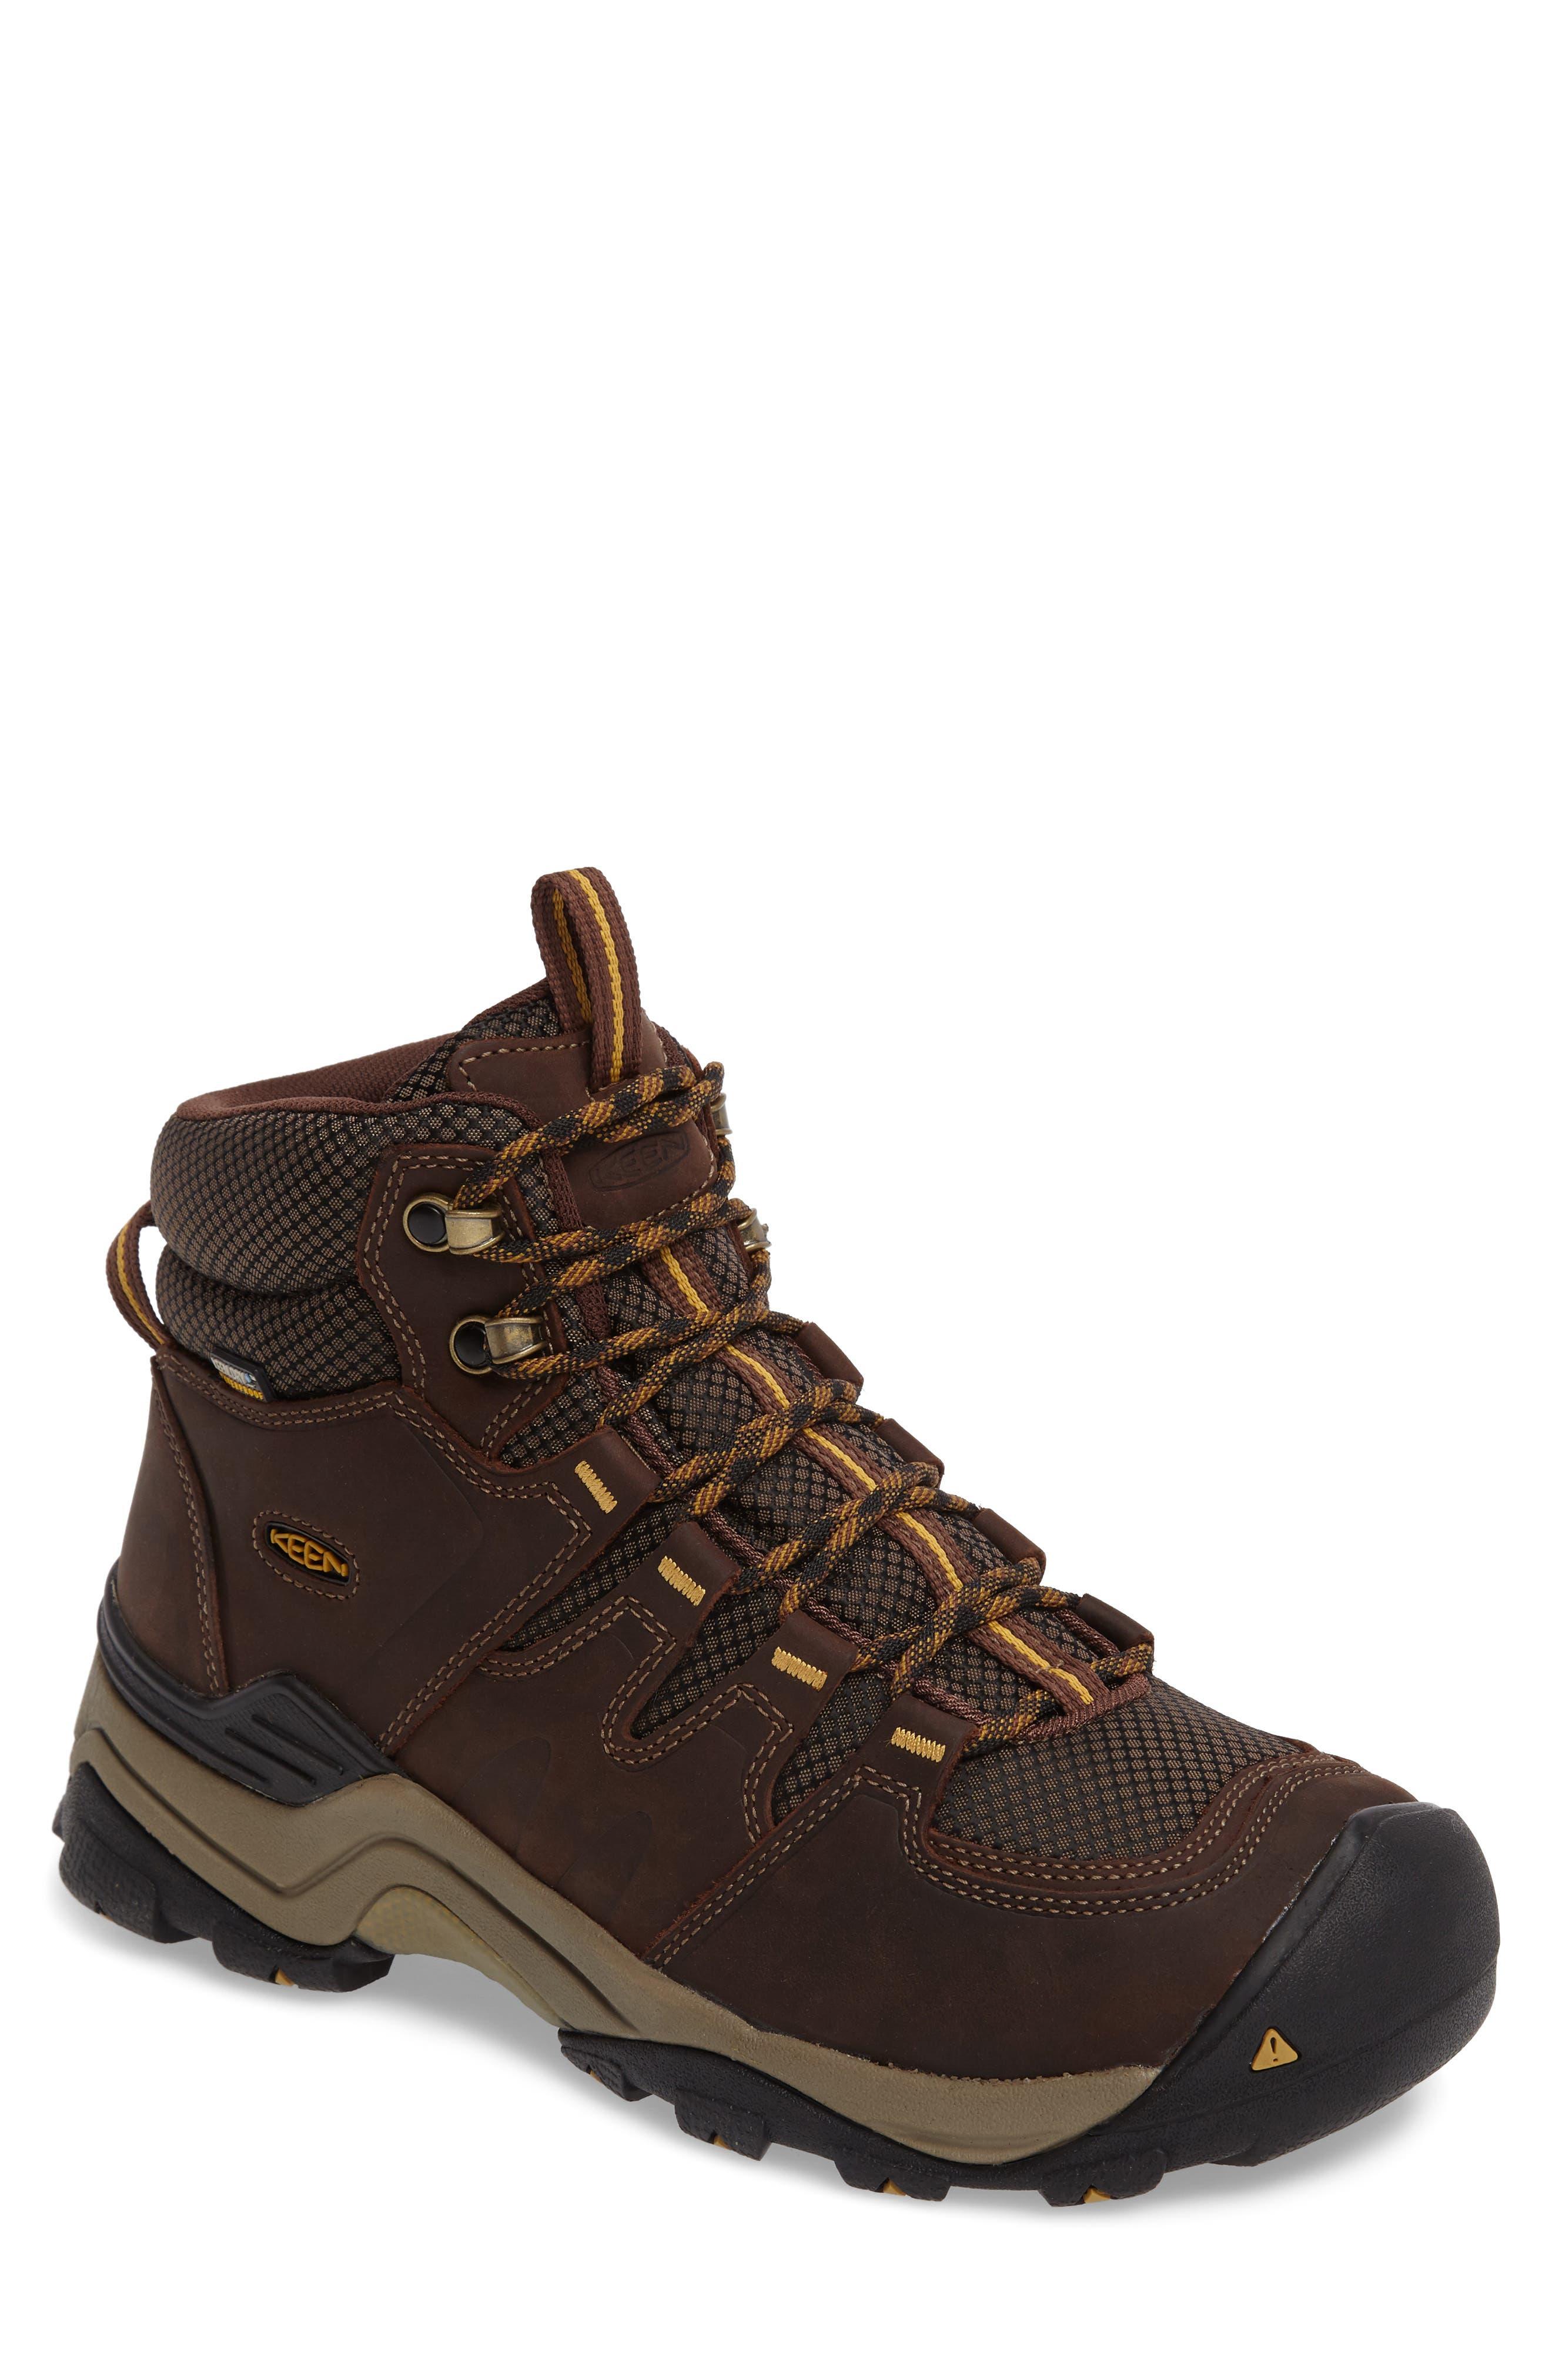 KEEN Gypsum II Waterproof Hiking Boot